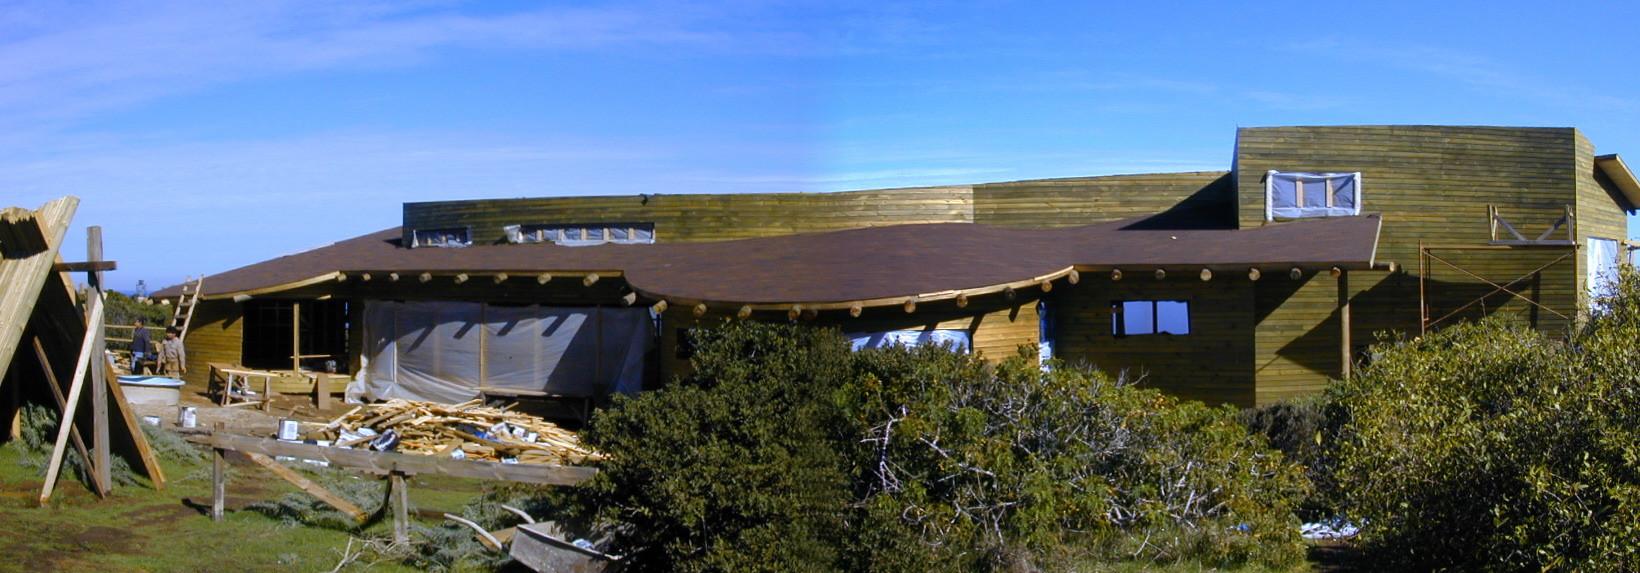 techos (1).jpg